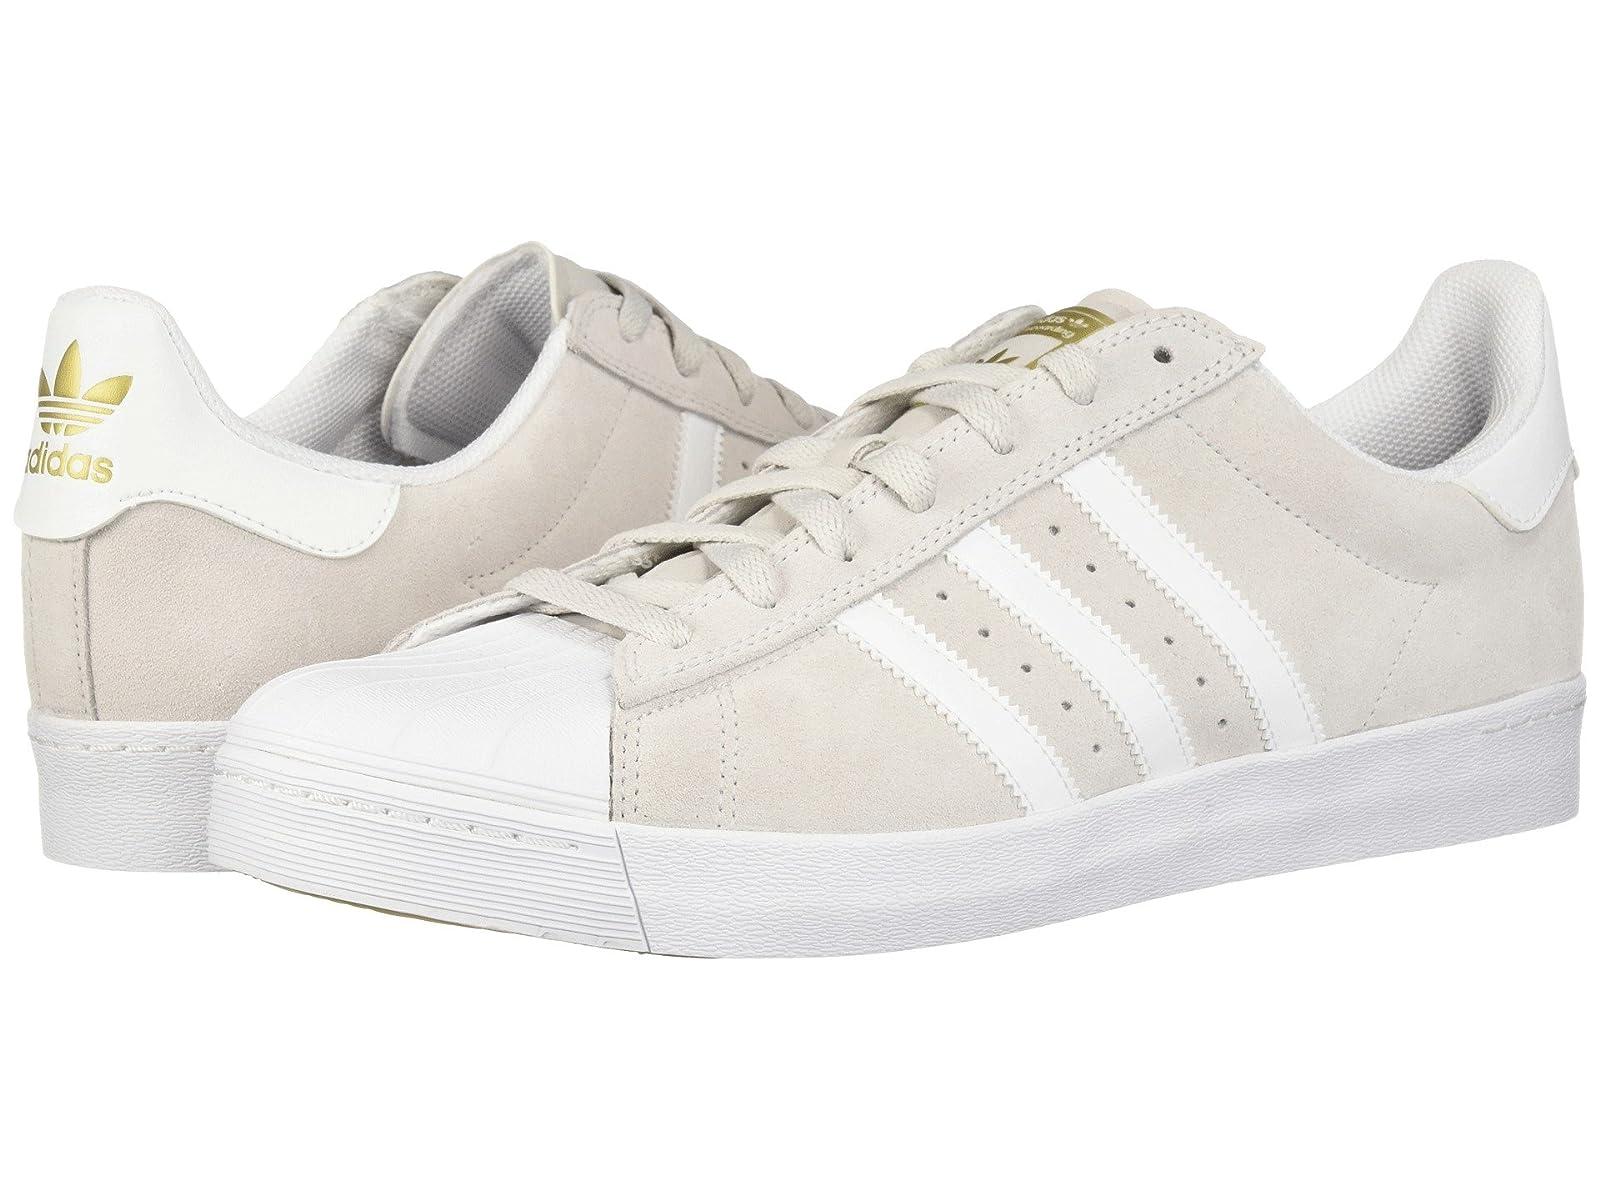 adidas Skateboarding Superstar Vulc ADVAtmospheric grades have affordable shoes